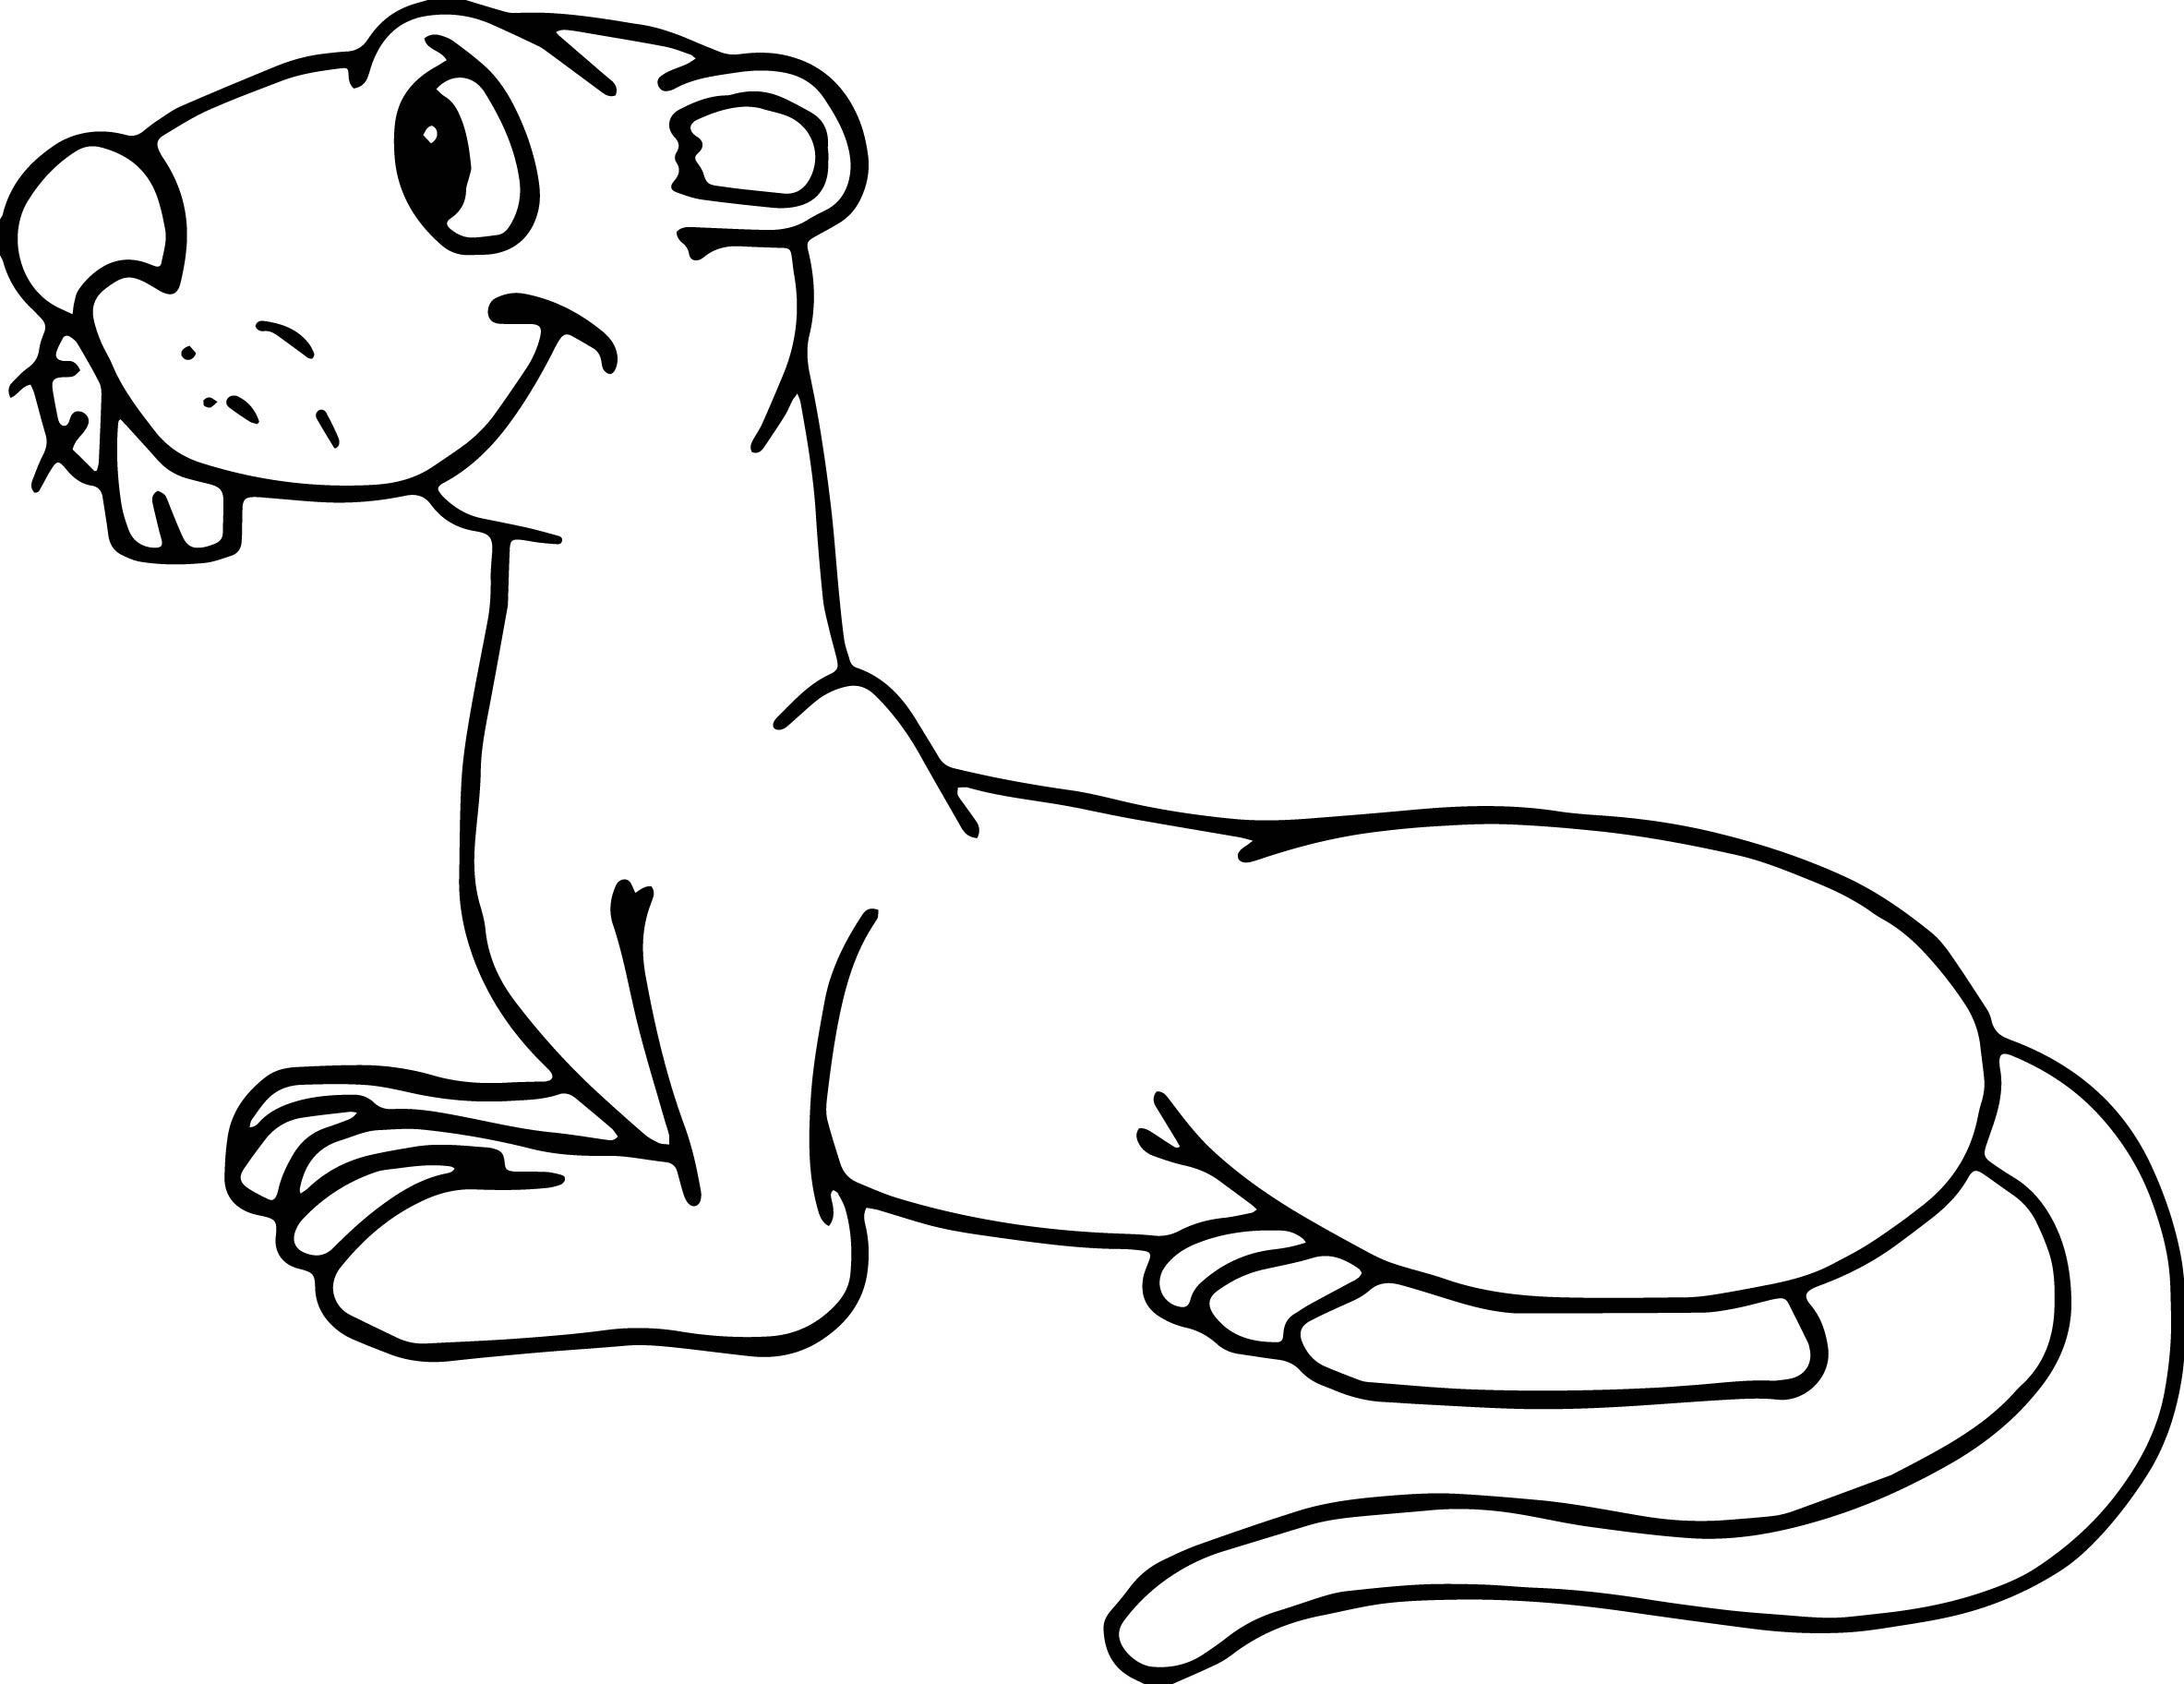 Sit Groundhog Coloring Page